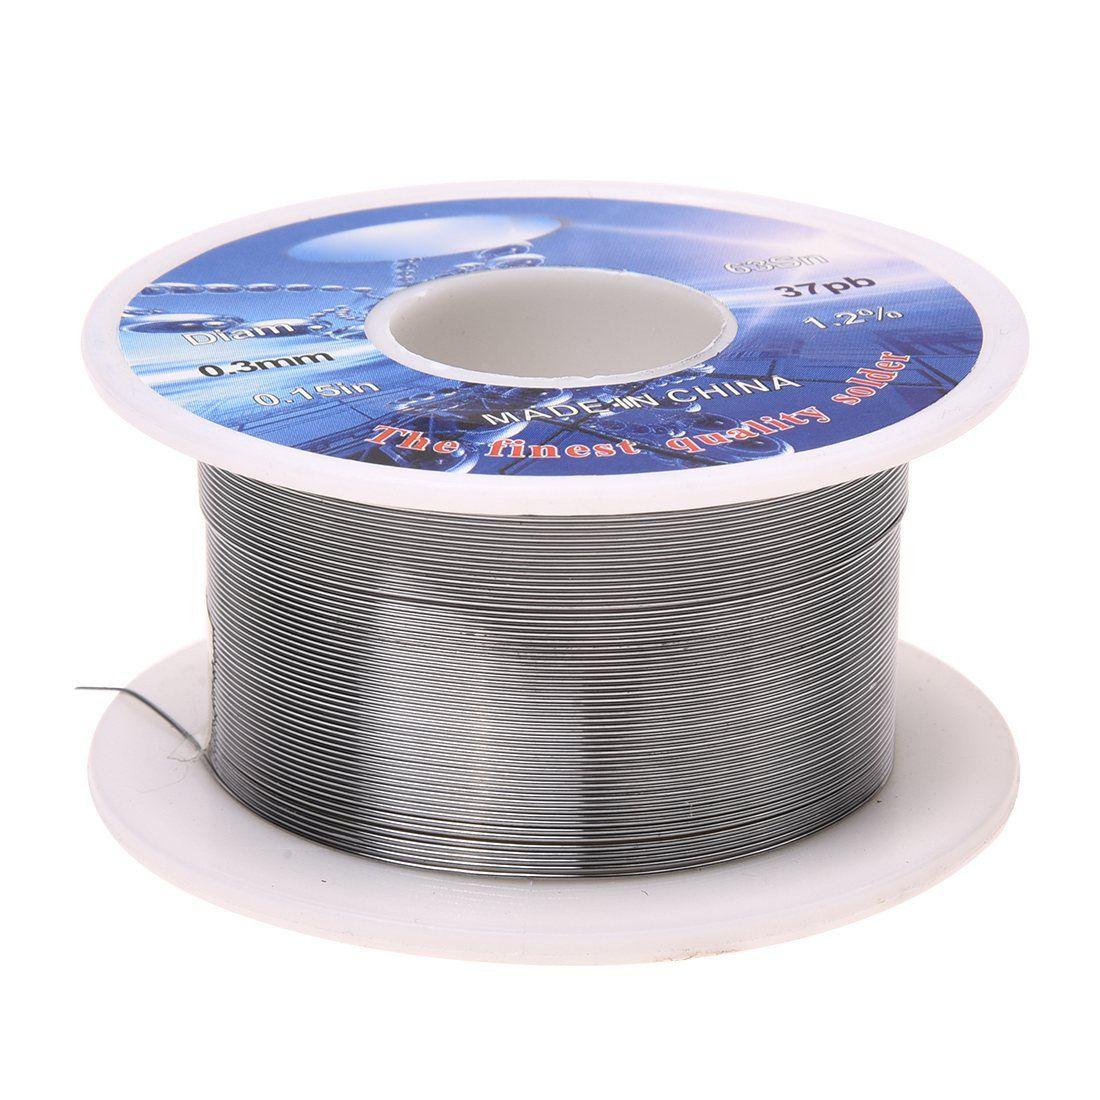 Solid Solder 0 3mm Dia Flux Core 63 Tin 37 Lead Long Wire Reel Affiliate Wire Reel Welding Wire Soldering